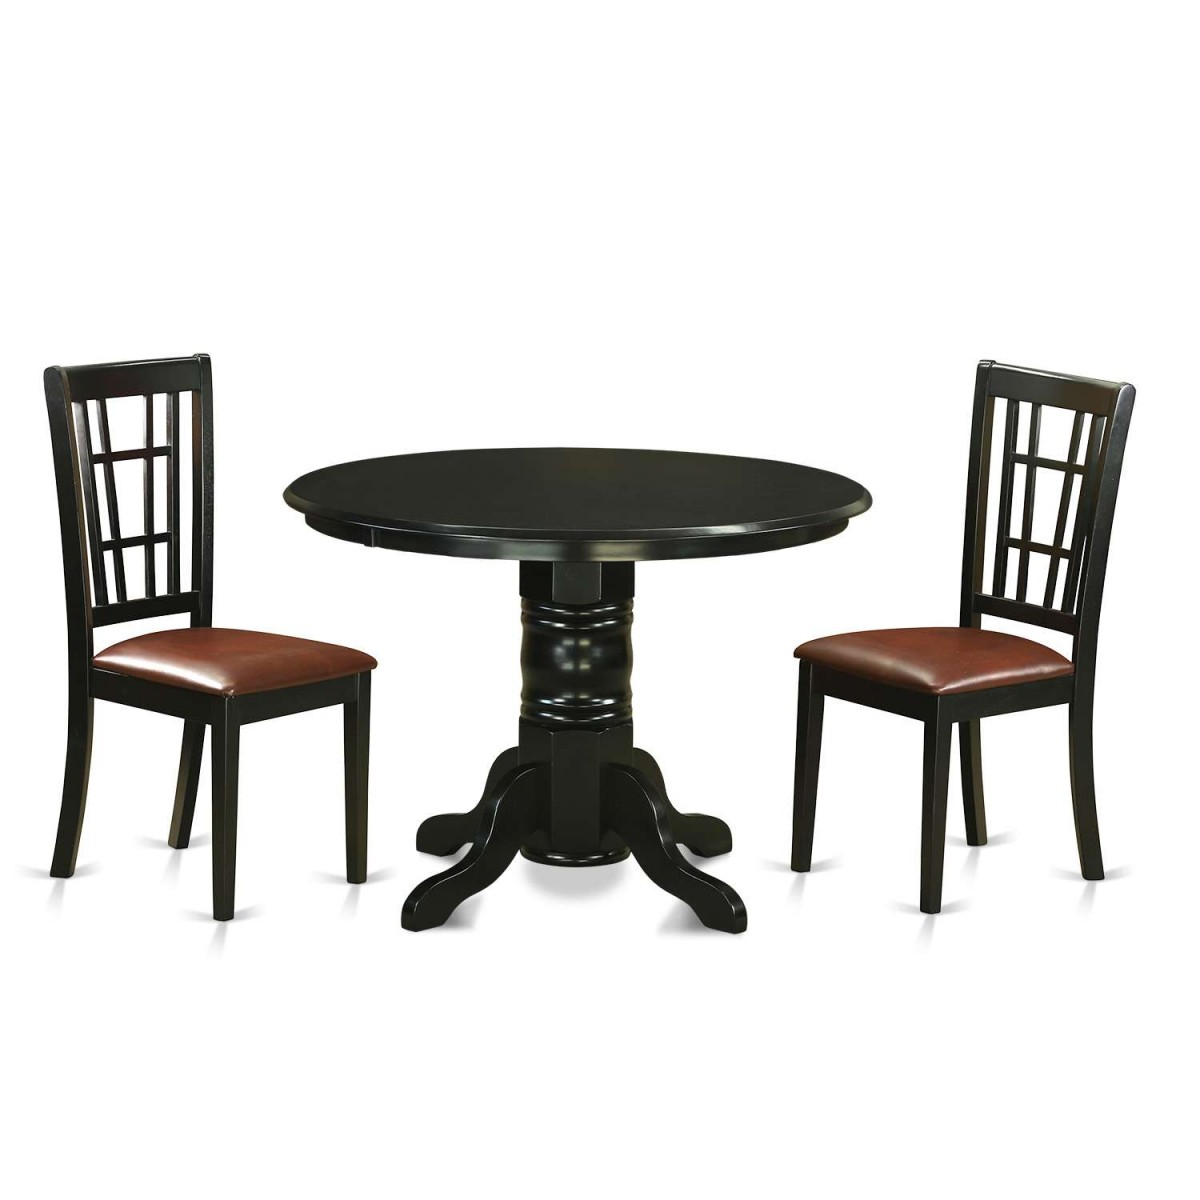 East West Nicoli 6 Piece Dining Set: East West Furniture Shelton 3 Piece Dining Table Set